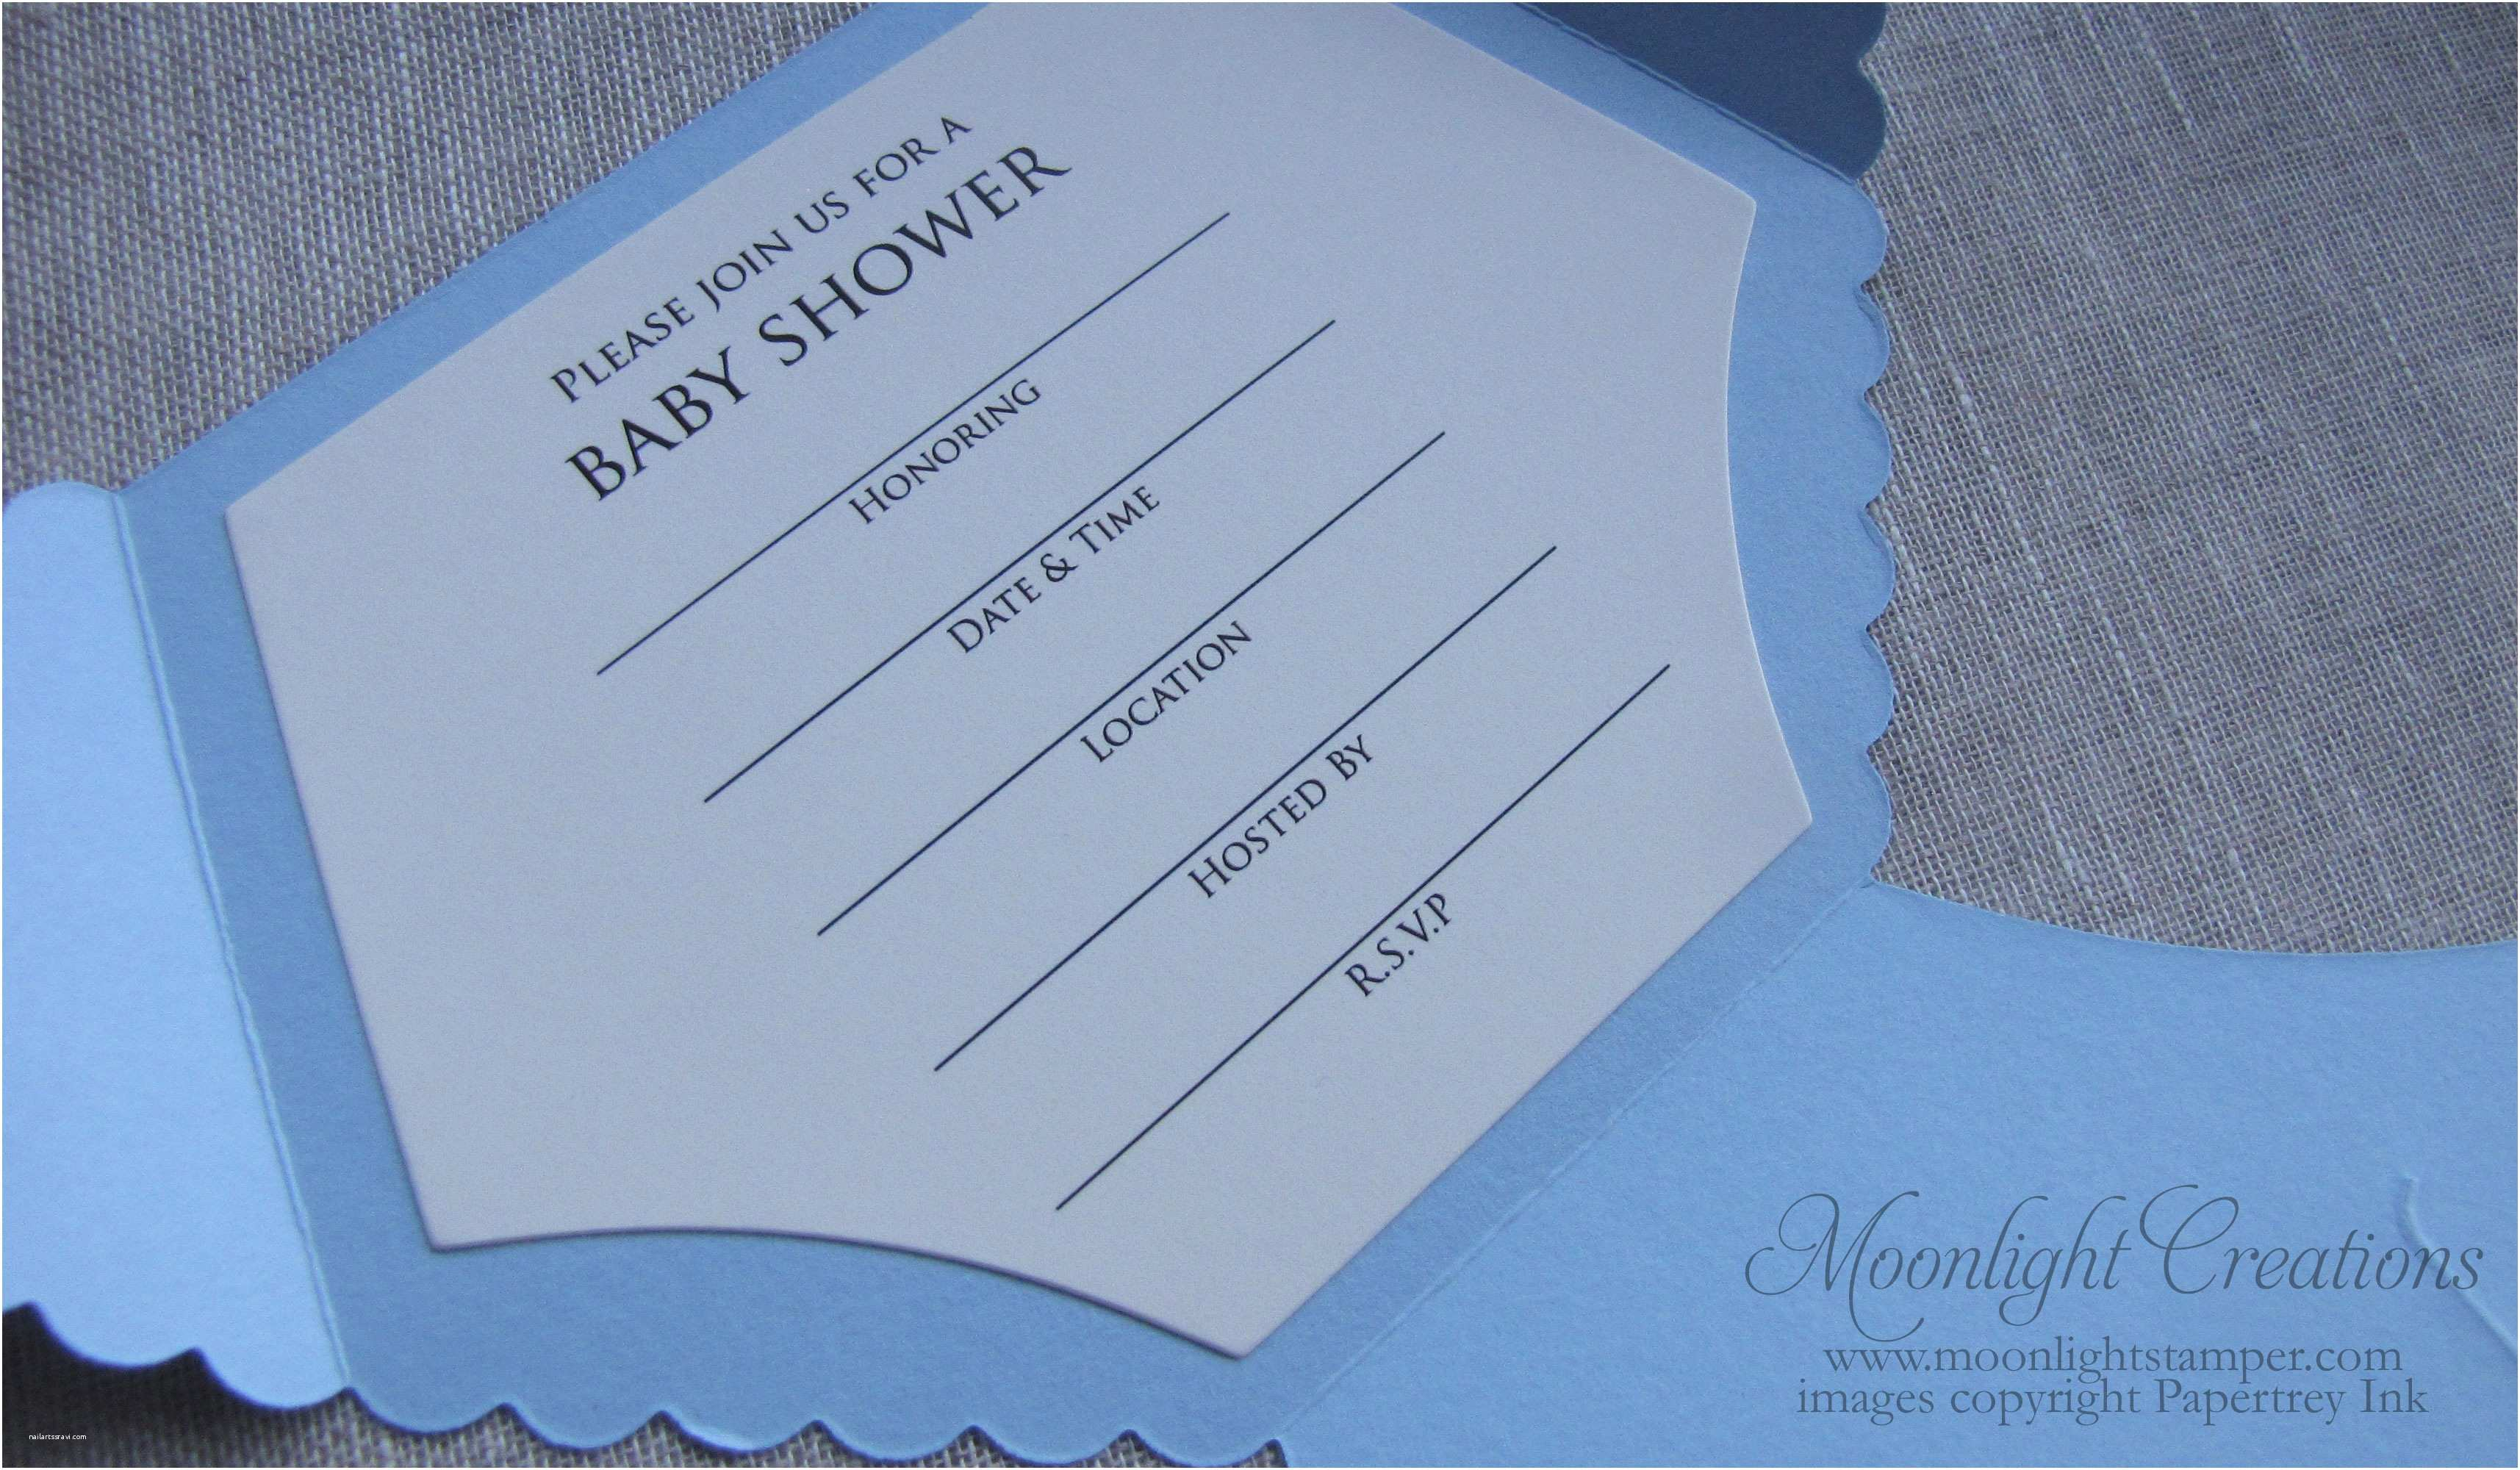 Baby Shower Invitations Ideas for Boys Unique Baby Shower Invitations for Boys